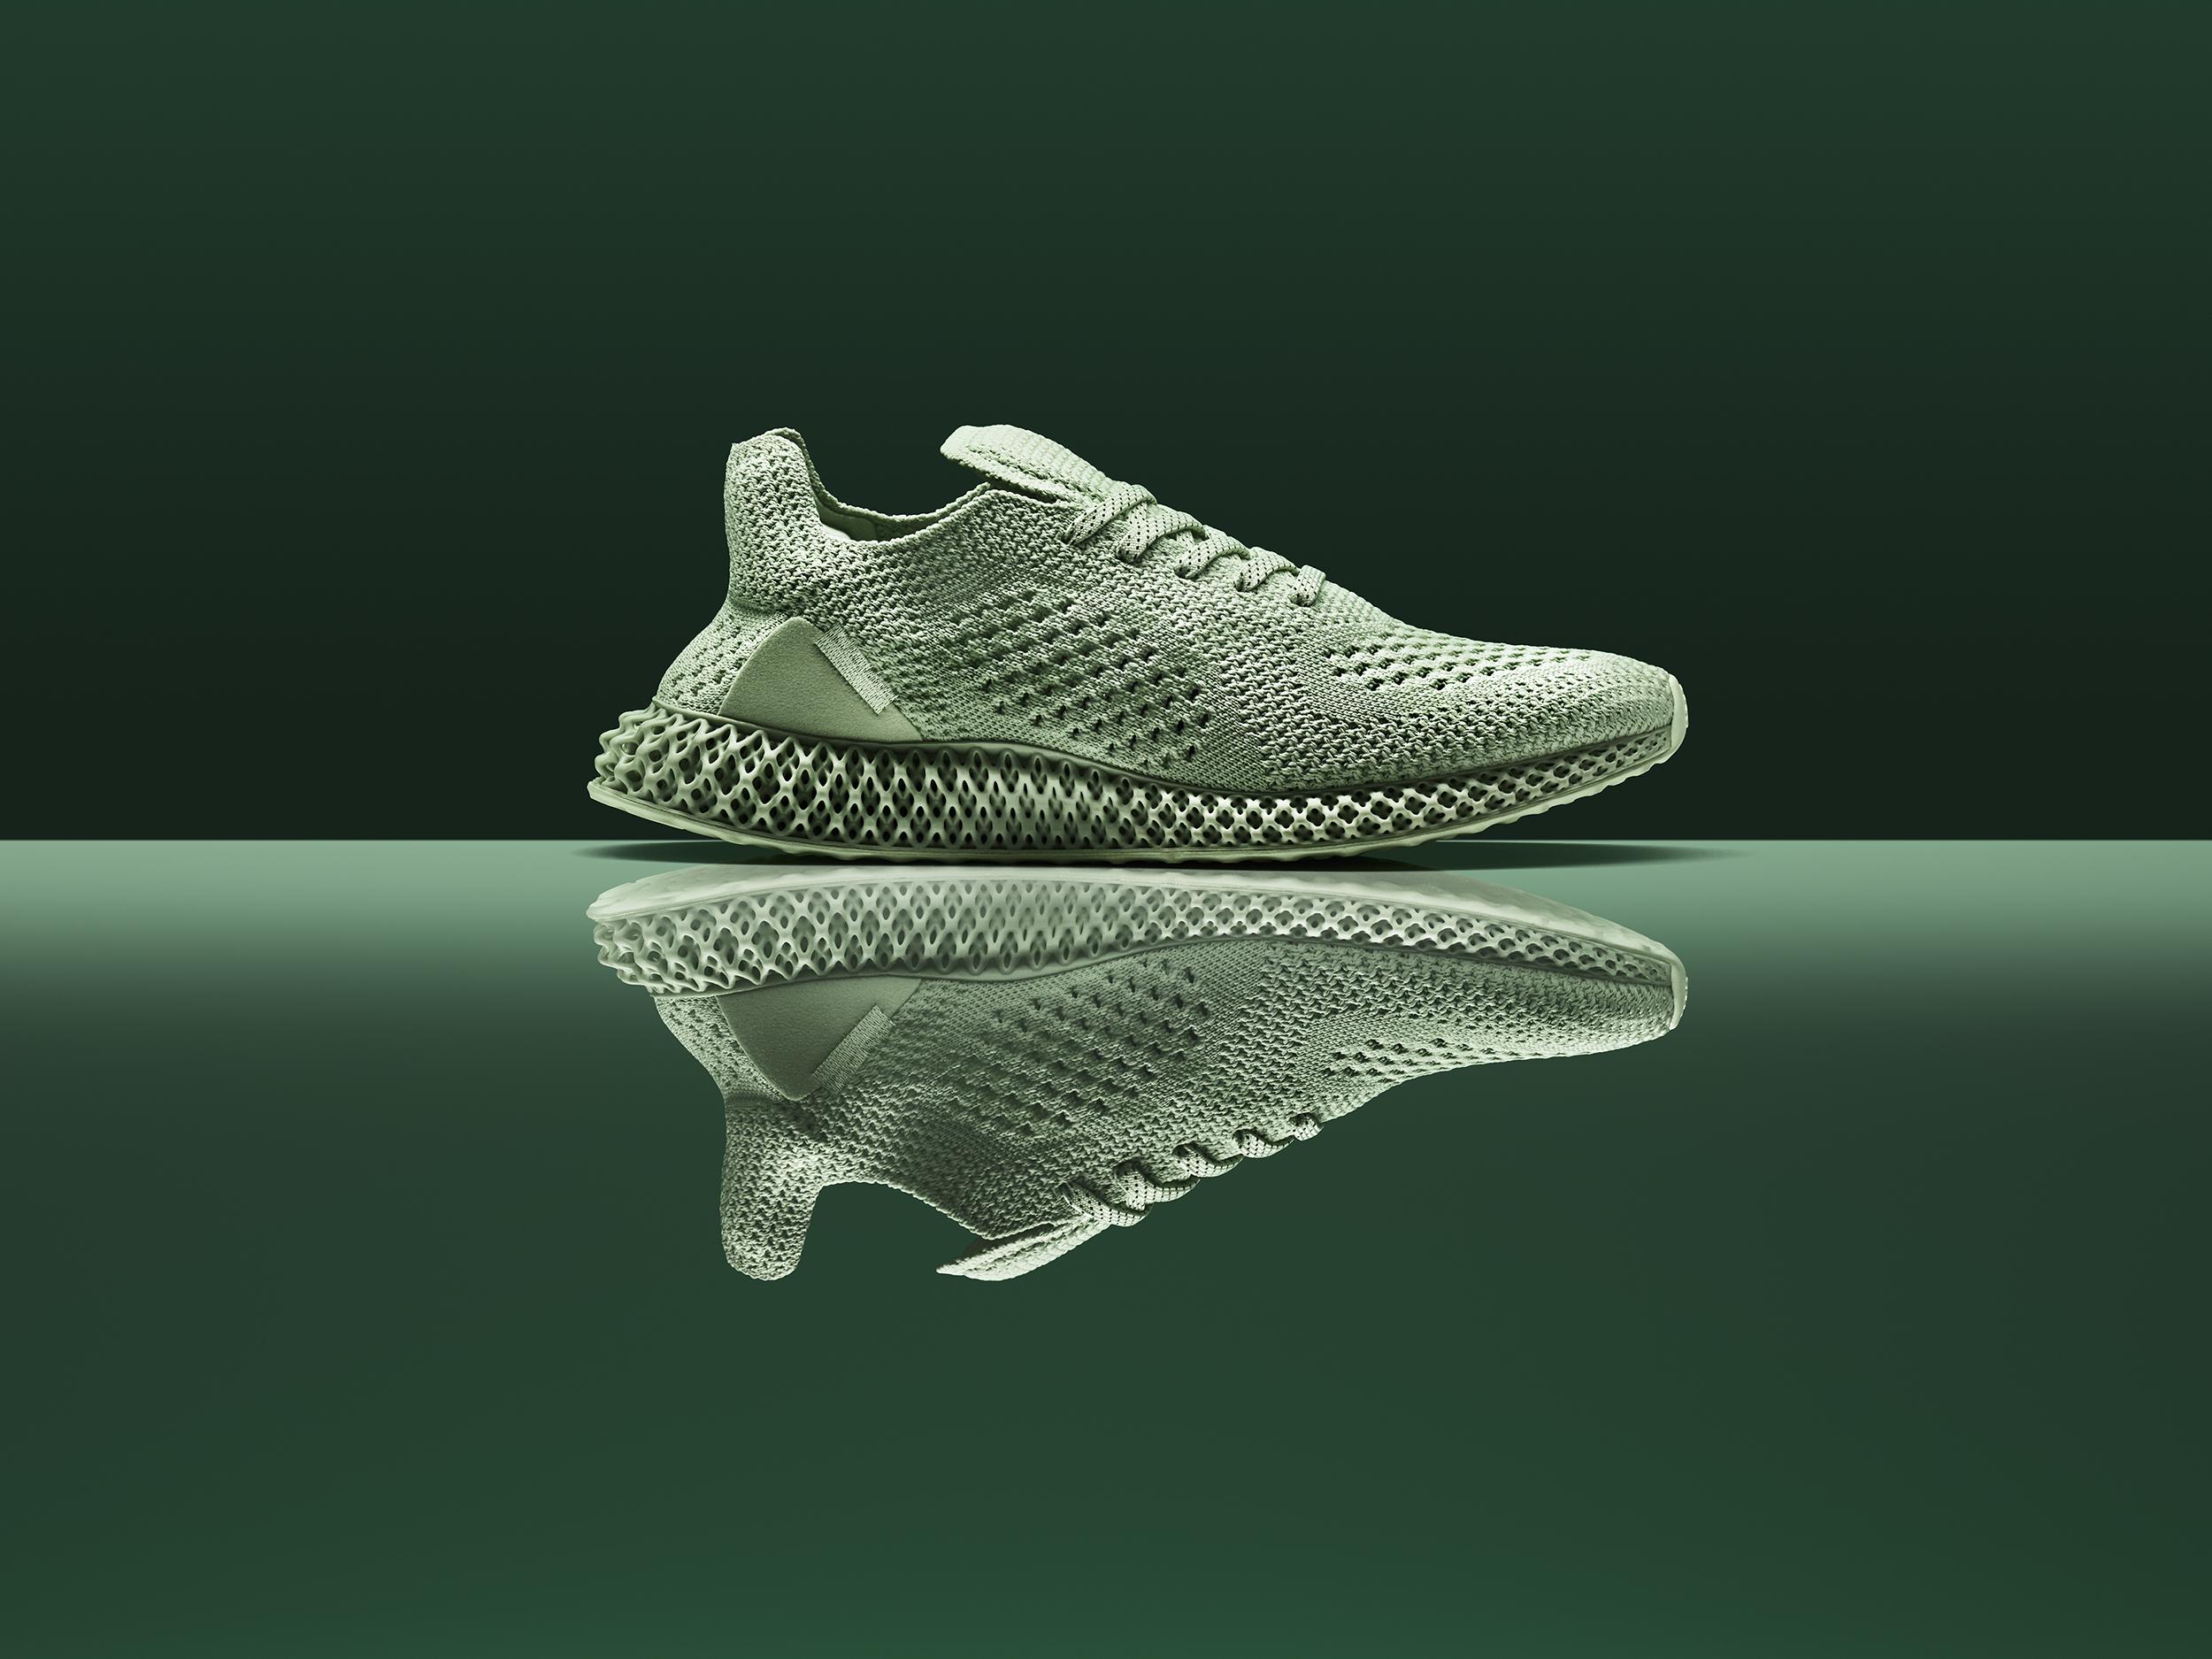 f4dd451c0bd0b9 adidas Originals and Daniel Arsham reveal the  FUTURE ARSHAM 4D   silhouette